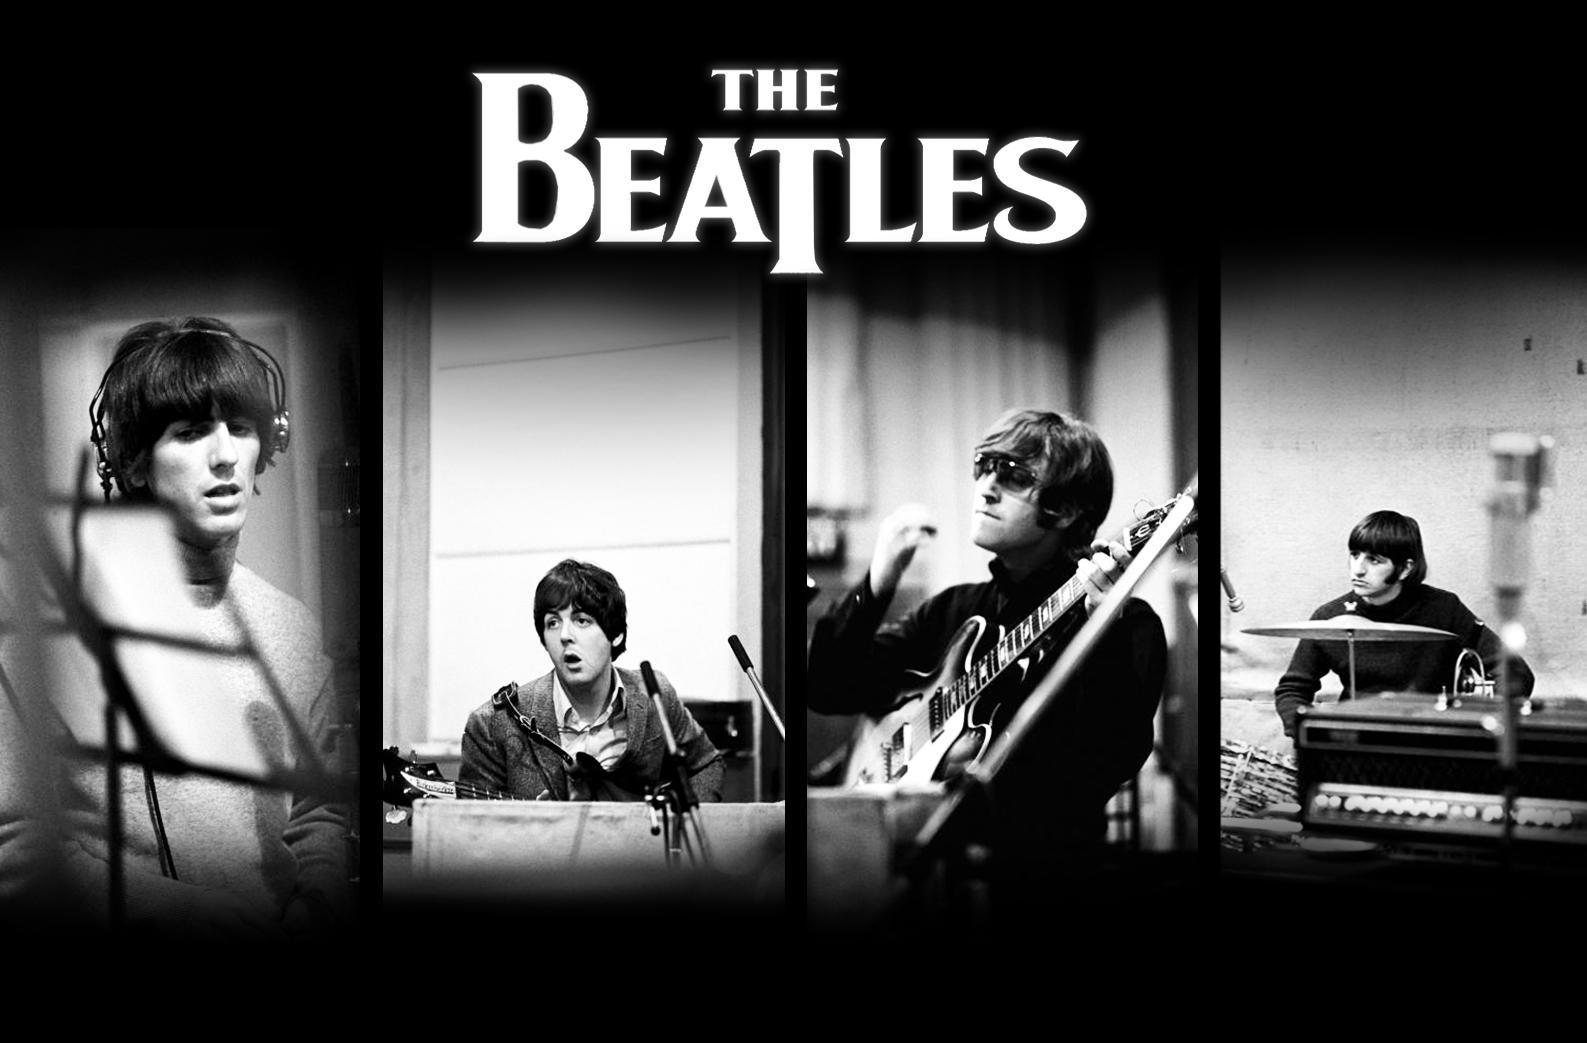 Most Inspiring Wallpaper Logo The Beatles - the_beatles_wallpaper_original_by_conniechan  Image_219419.jpg